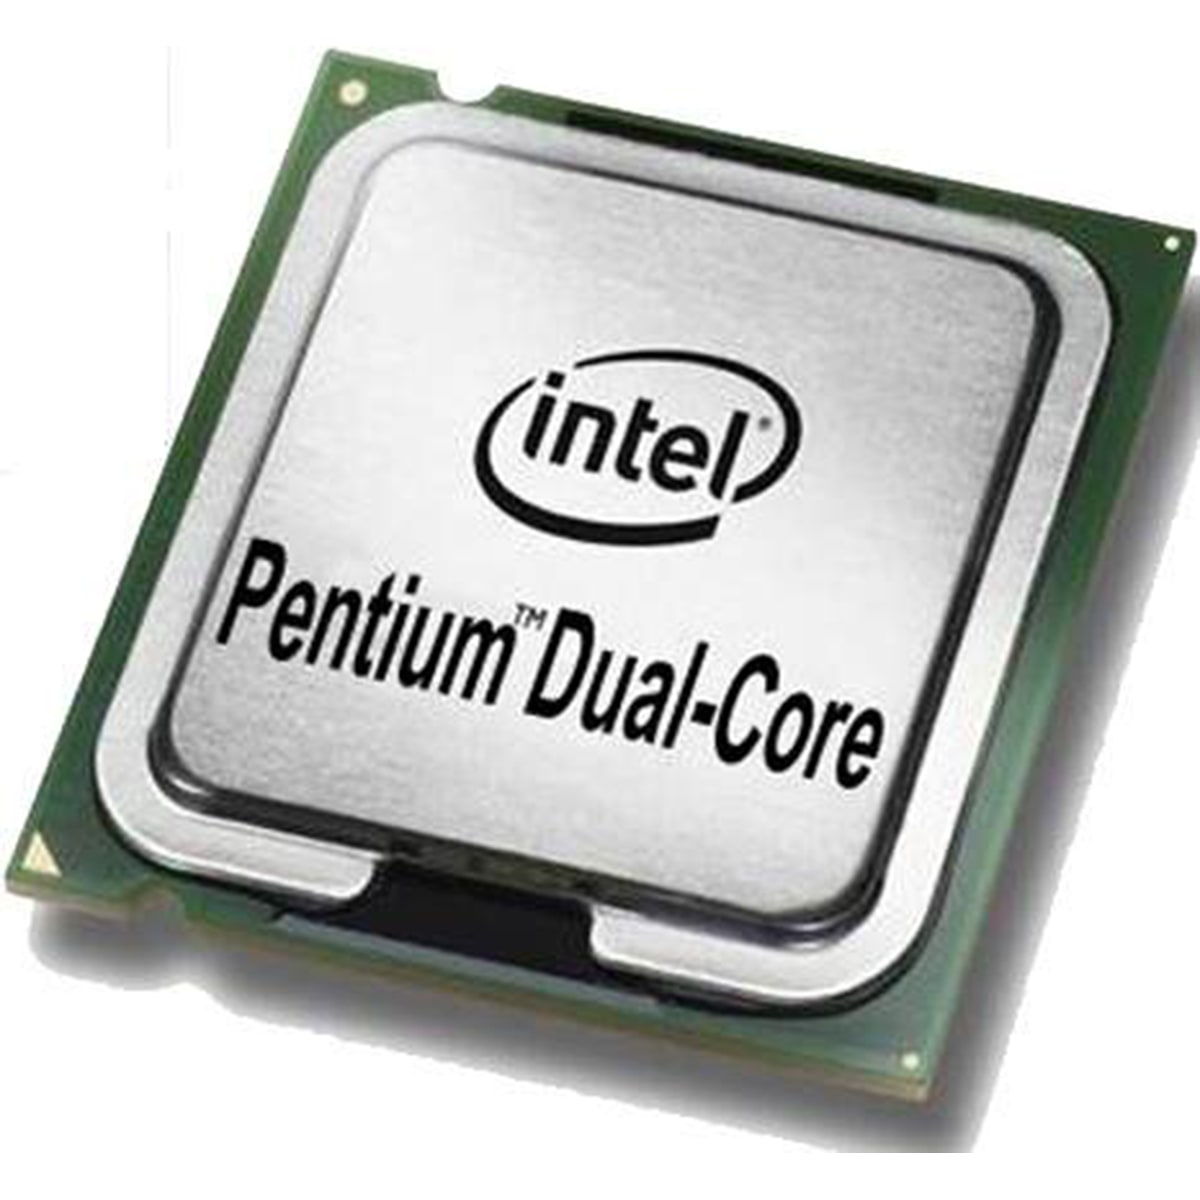 Processador Intel Dual Core E2180 2,00Ghz 1M Cache 800 MHz Socket 775 - Seminovo